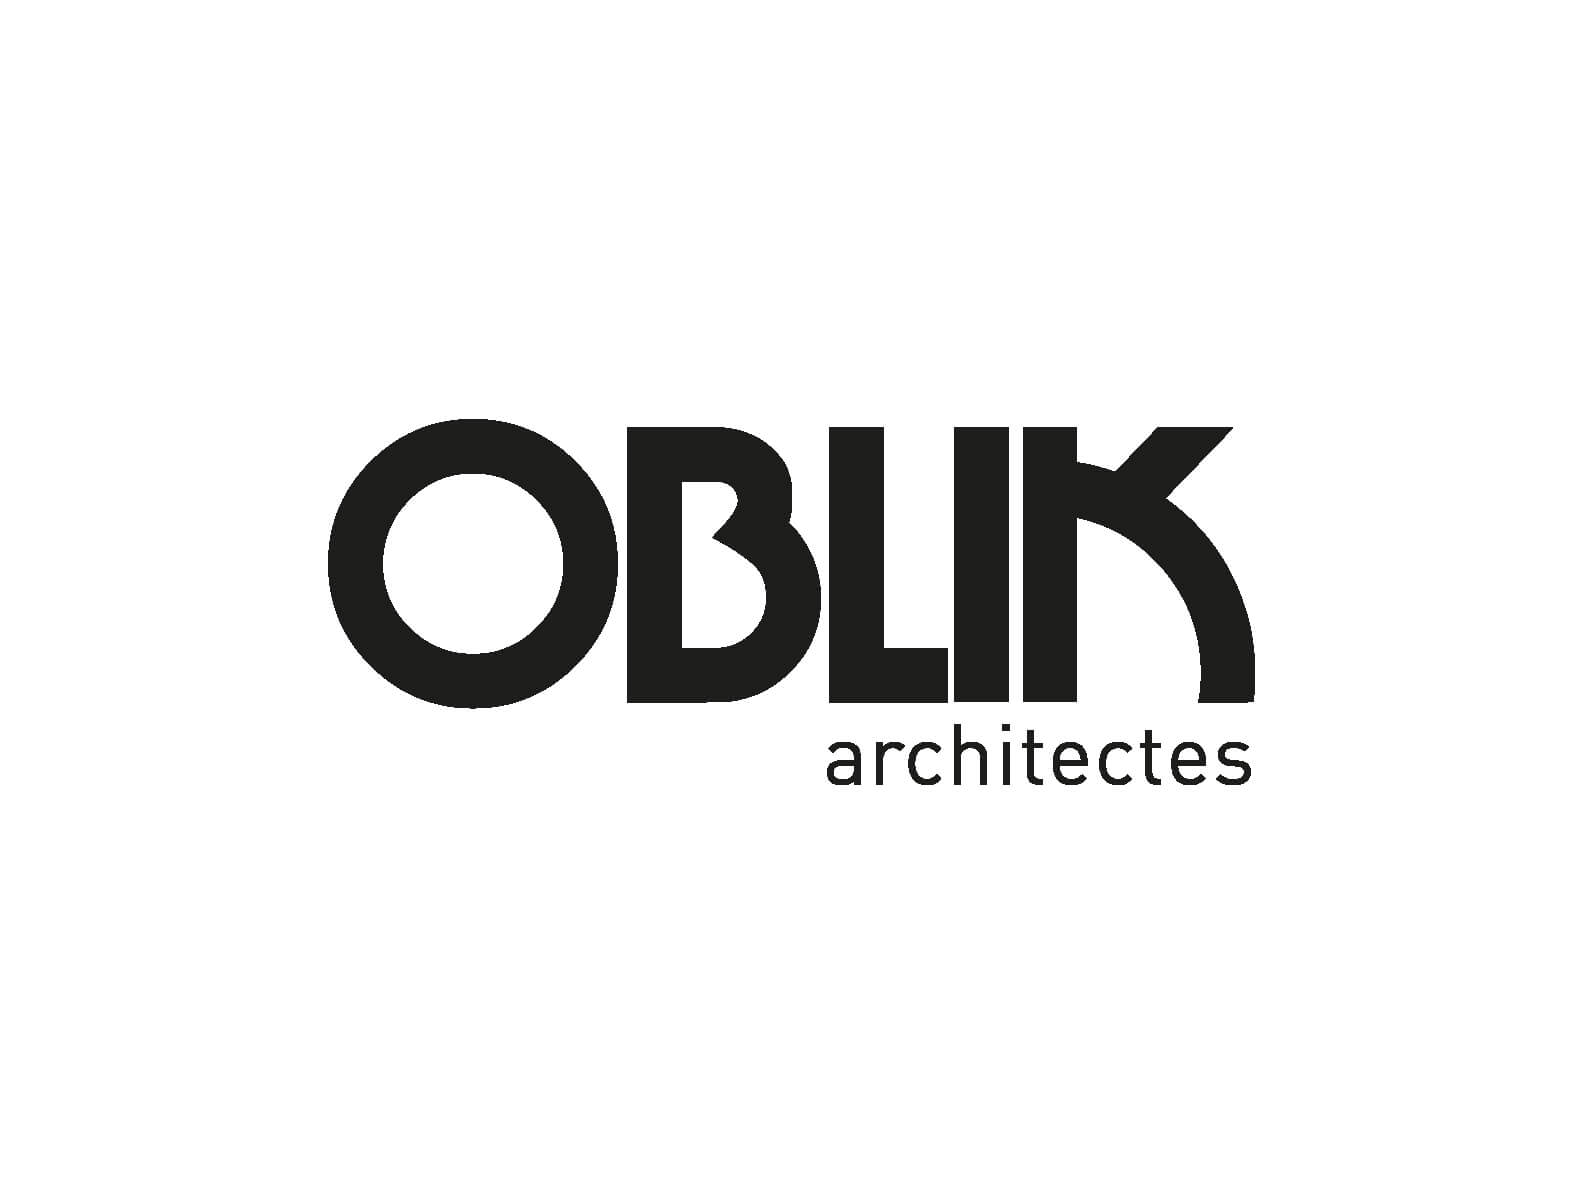 agence kayak communication web lille nord oblikarchitectes architecture